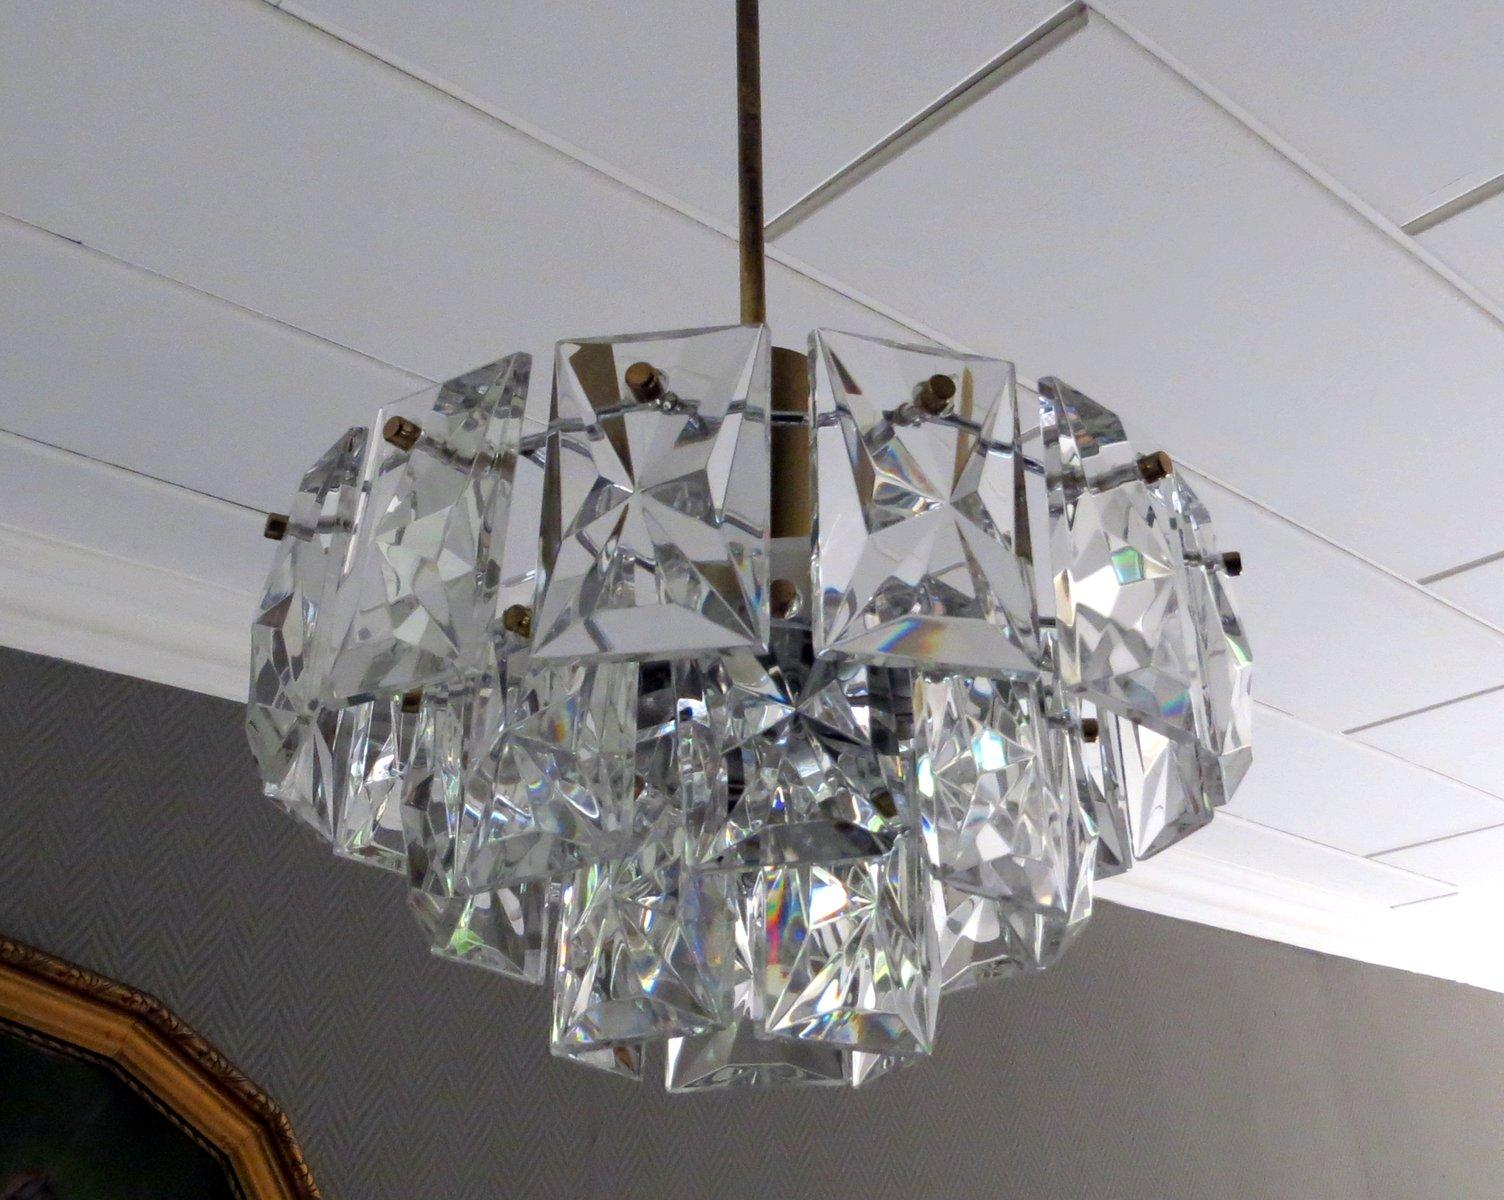 Crystal glass prism chandelier from kinkeldey 1960s for sale at pamono crystal glass prism chandelier from kinkeldey 1960s aloadofball Gallery